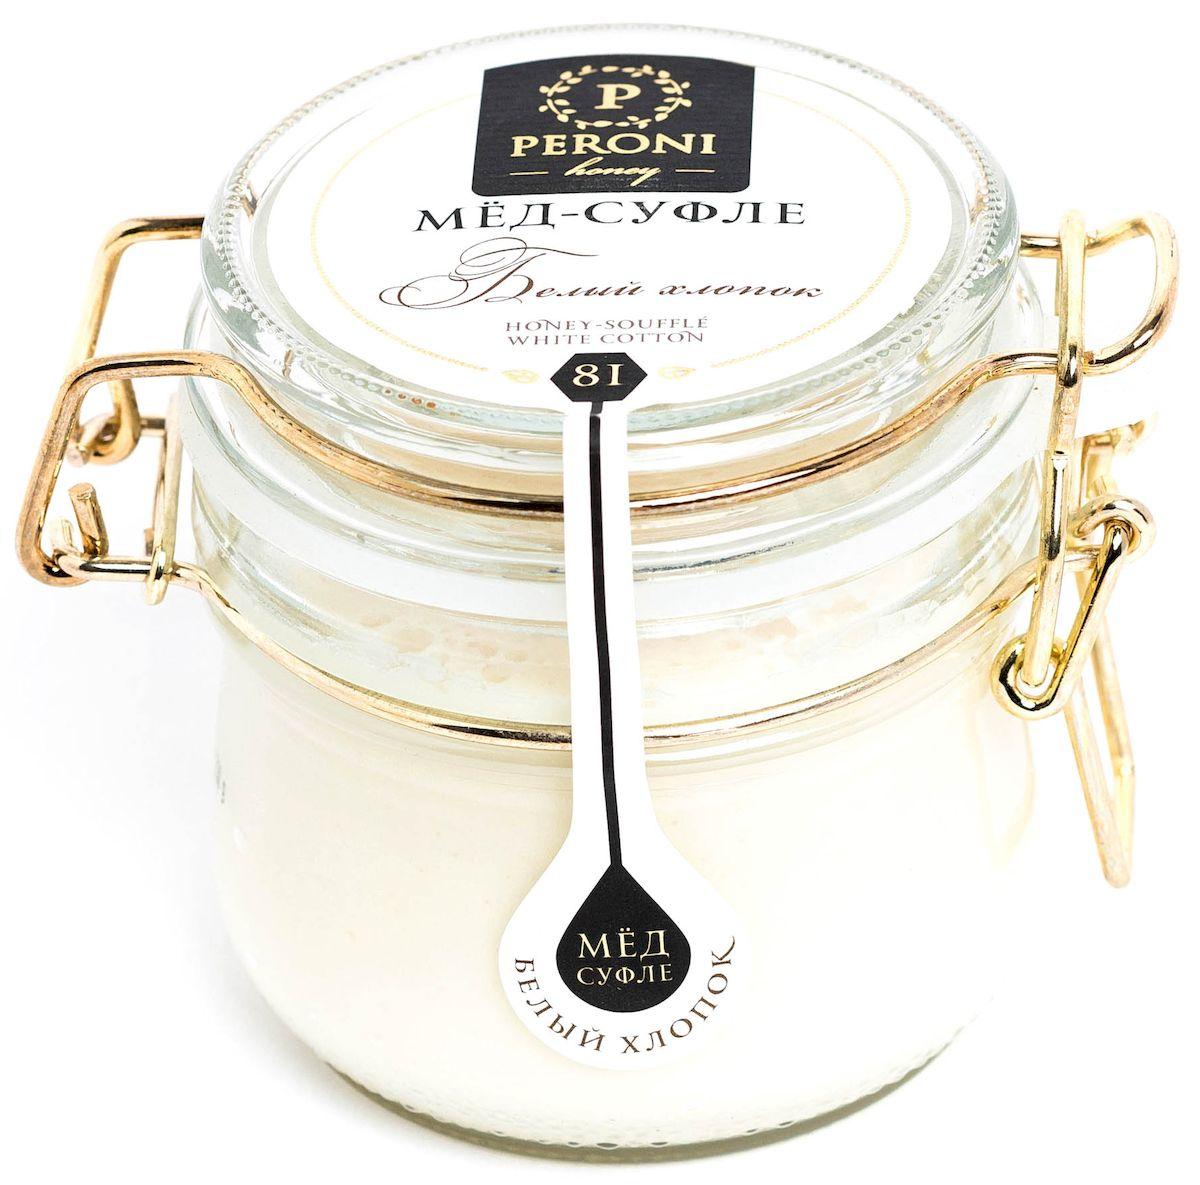 Peroni Белый хлопок мёд-суфле, 230 г peroni кедровый орешек мёд суфле 220 г